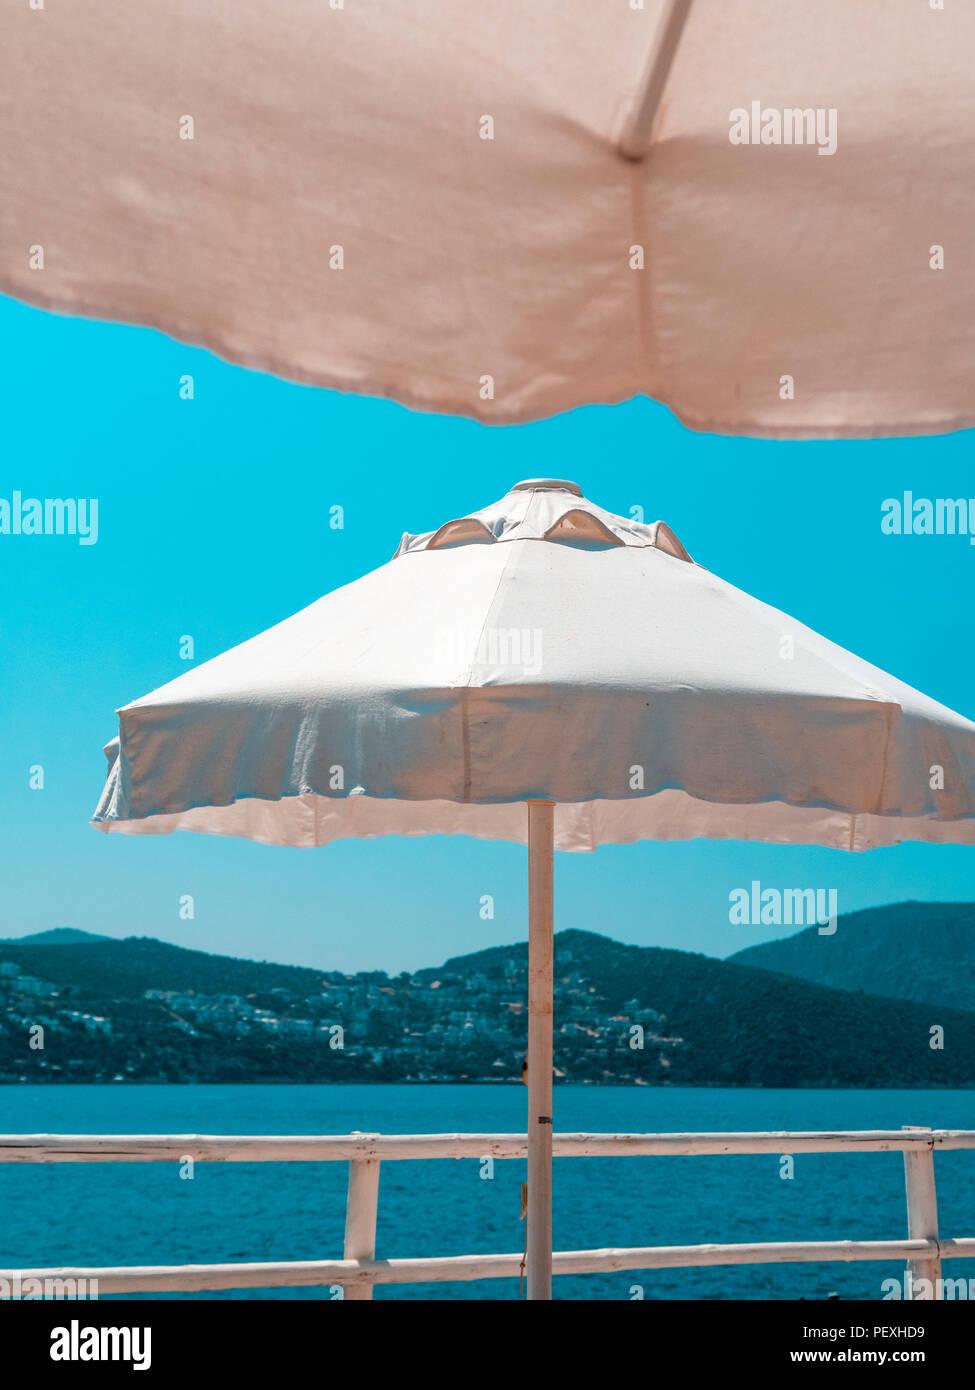 Beach Umbrellas against Blue Sky - Stock Image